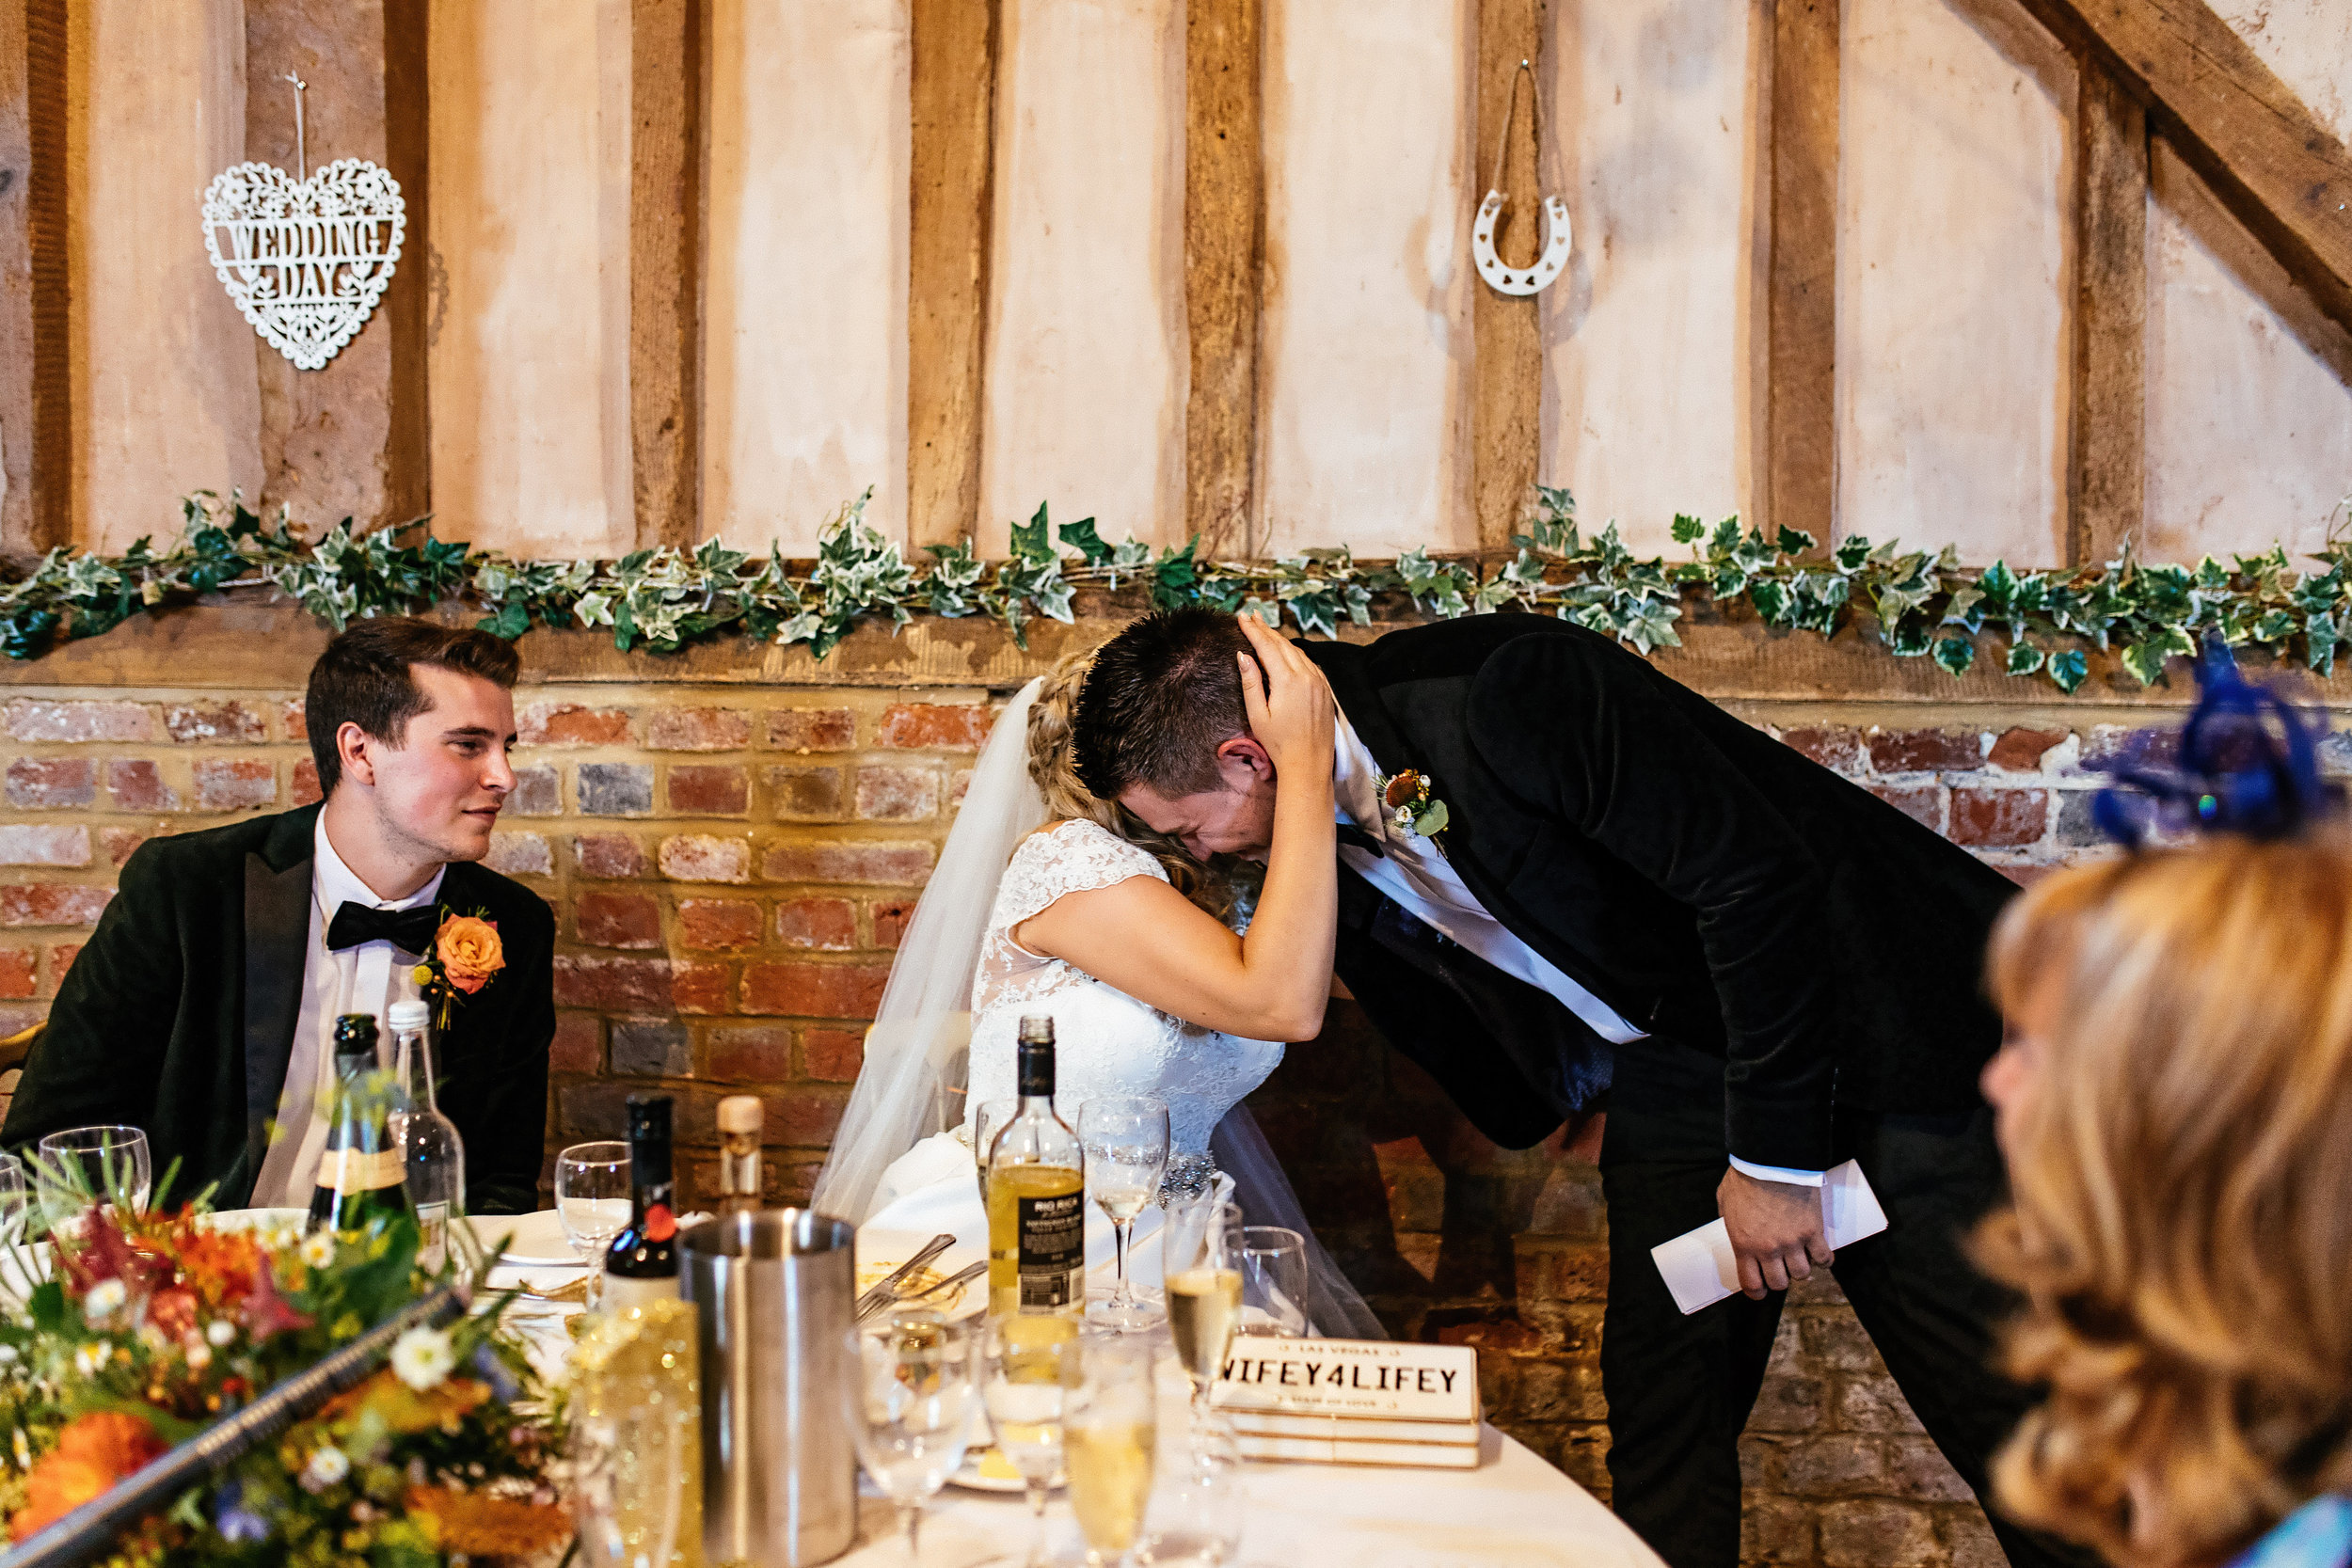 Tamara-and-Richard-Wedding-Highlights-76.jpg